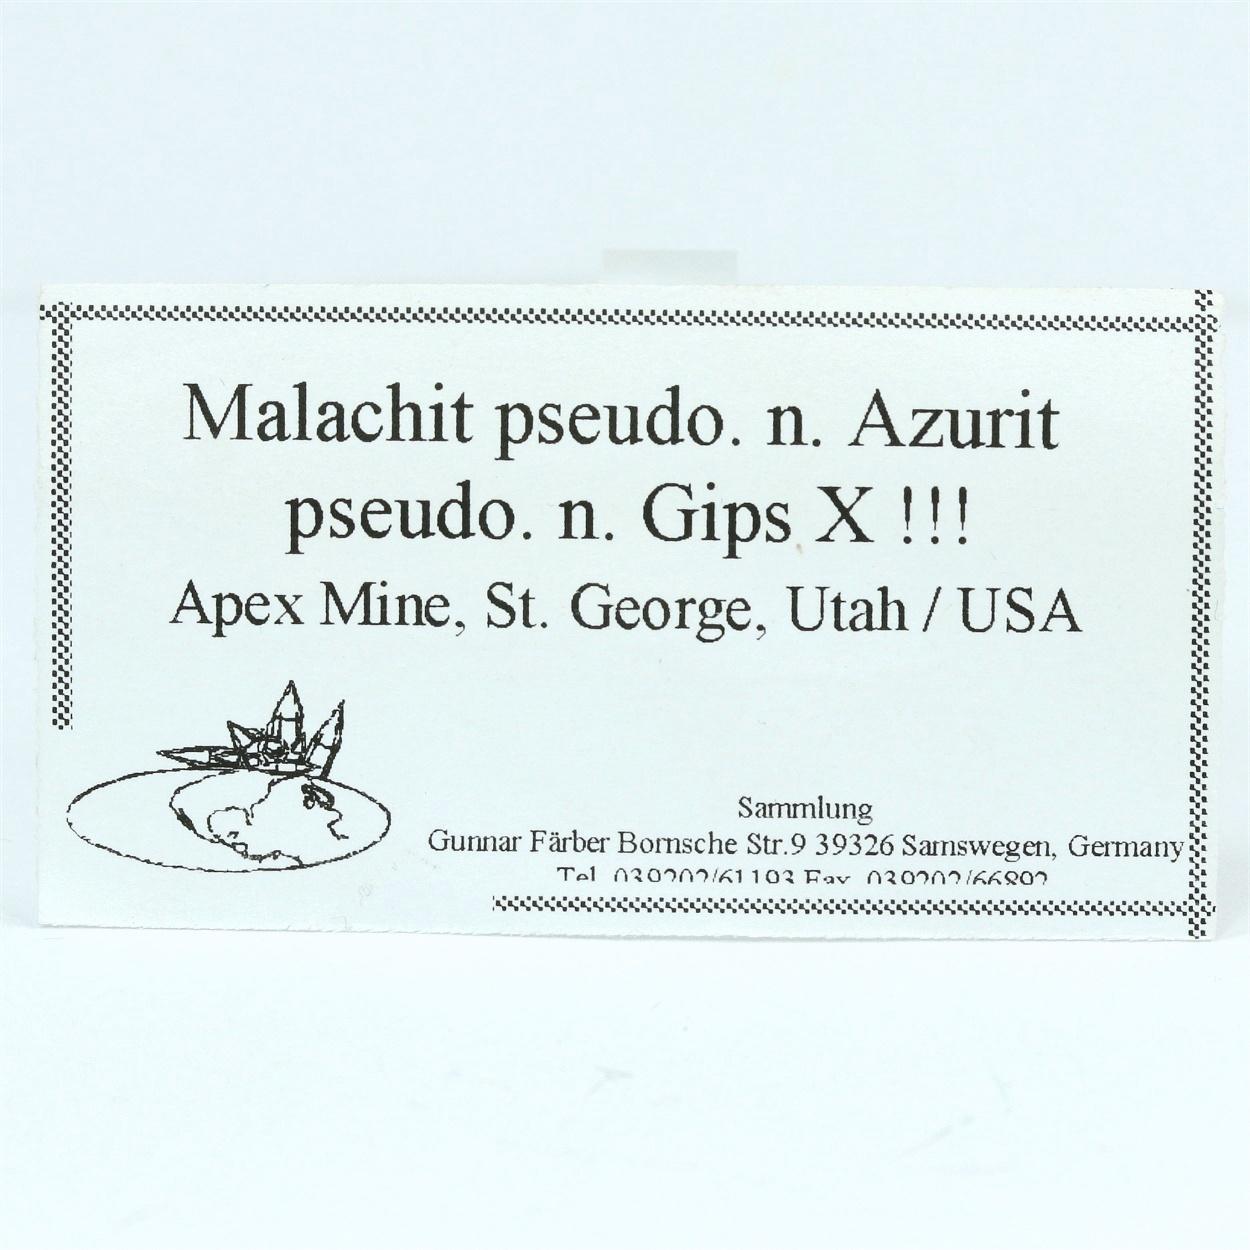 Malachite & Azurite Psm Gypsum